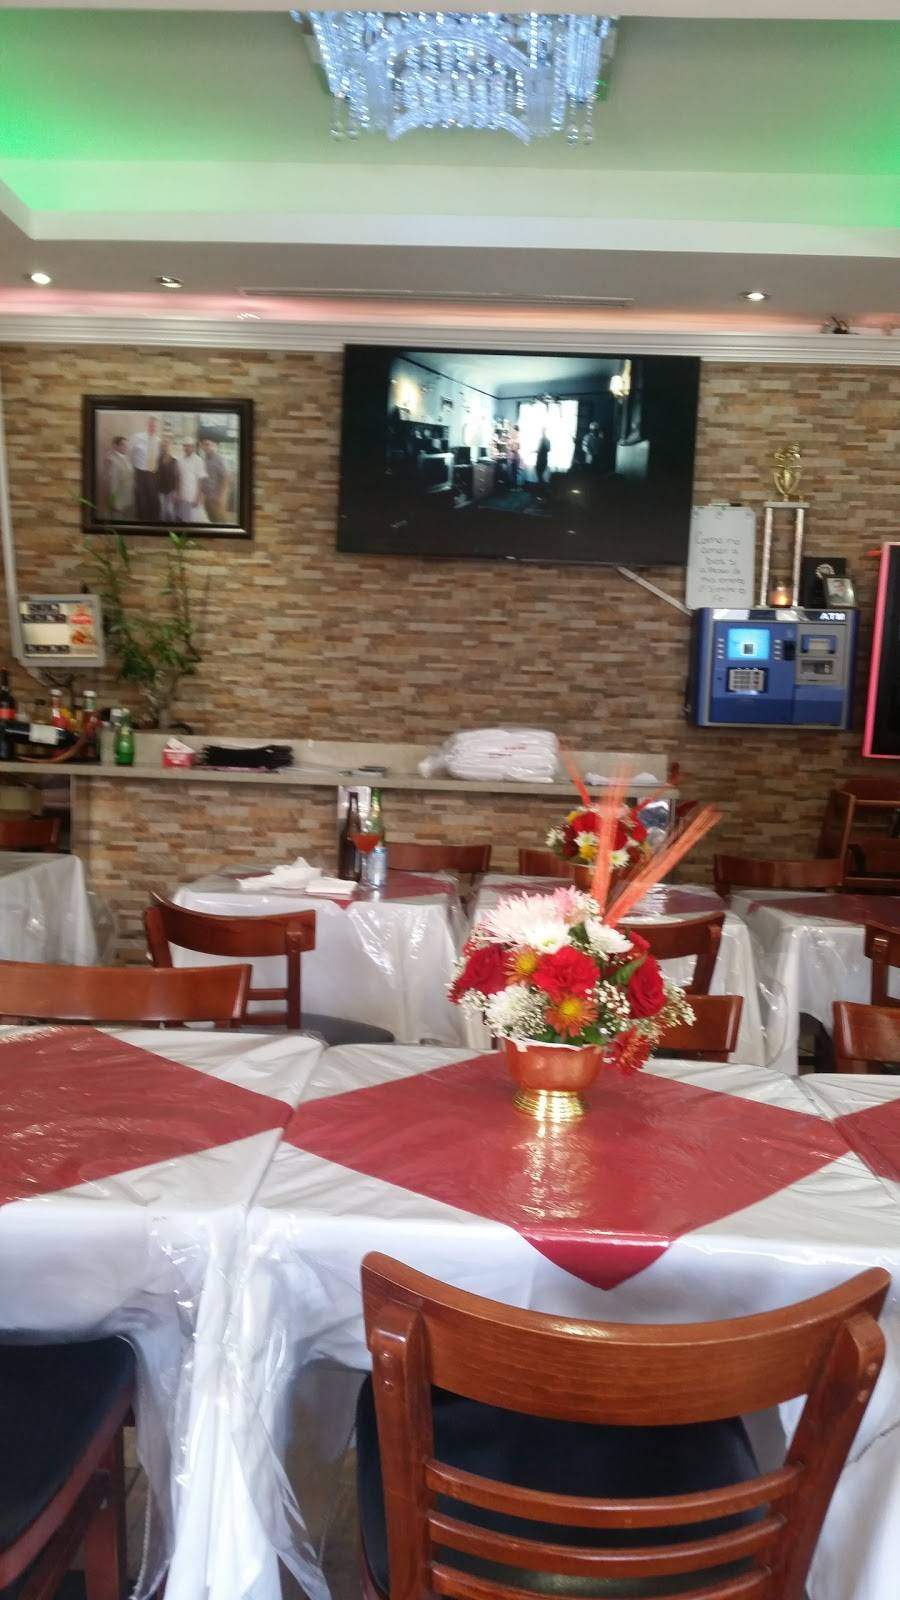 New Tavares   restaurant   234 Cleveland Street Btw Fulton Street &, Atlantic Ave, Brooklyn, NY 11208, USA   3472404609 OR +1 347-240-4609